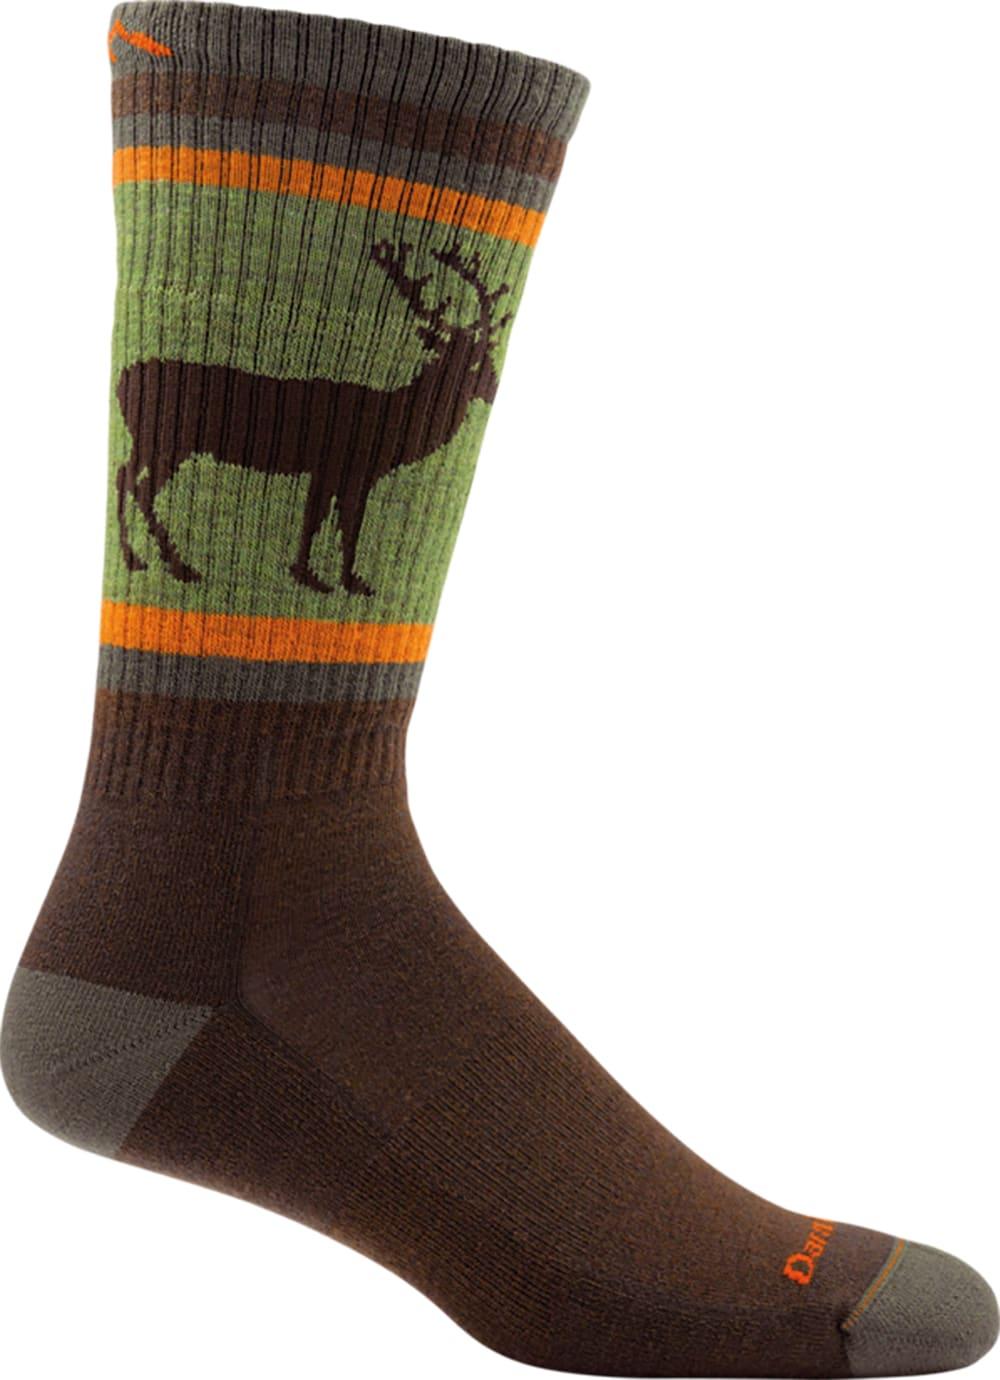 Darn Tough Uncle Buck Boot Cushion Socks 2019